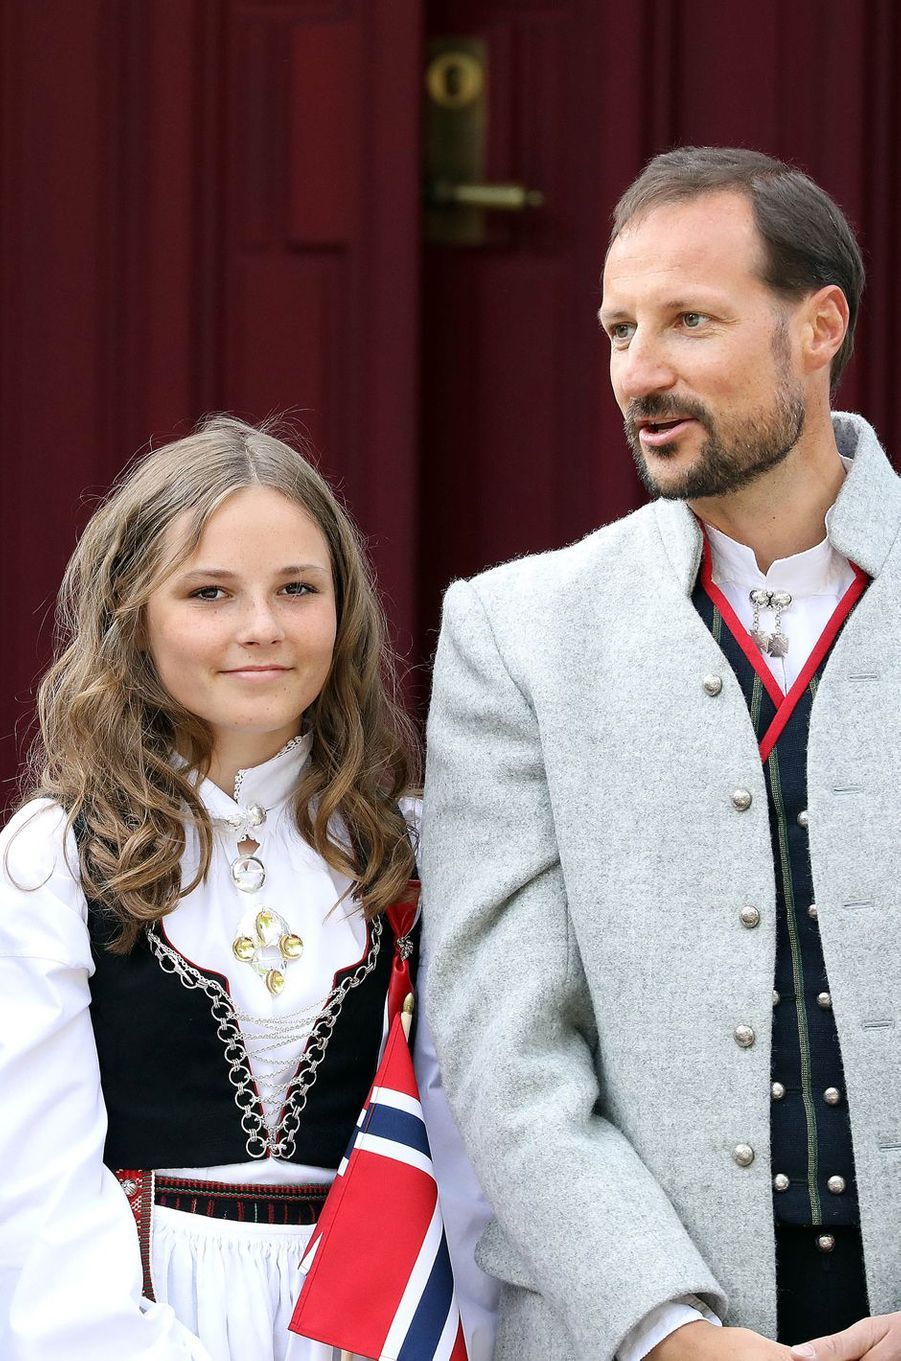 La princesse Ingrid Alexandra et le prince Haakon de Norvège à Asker, le 17 mai 2018